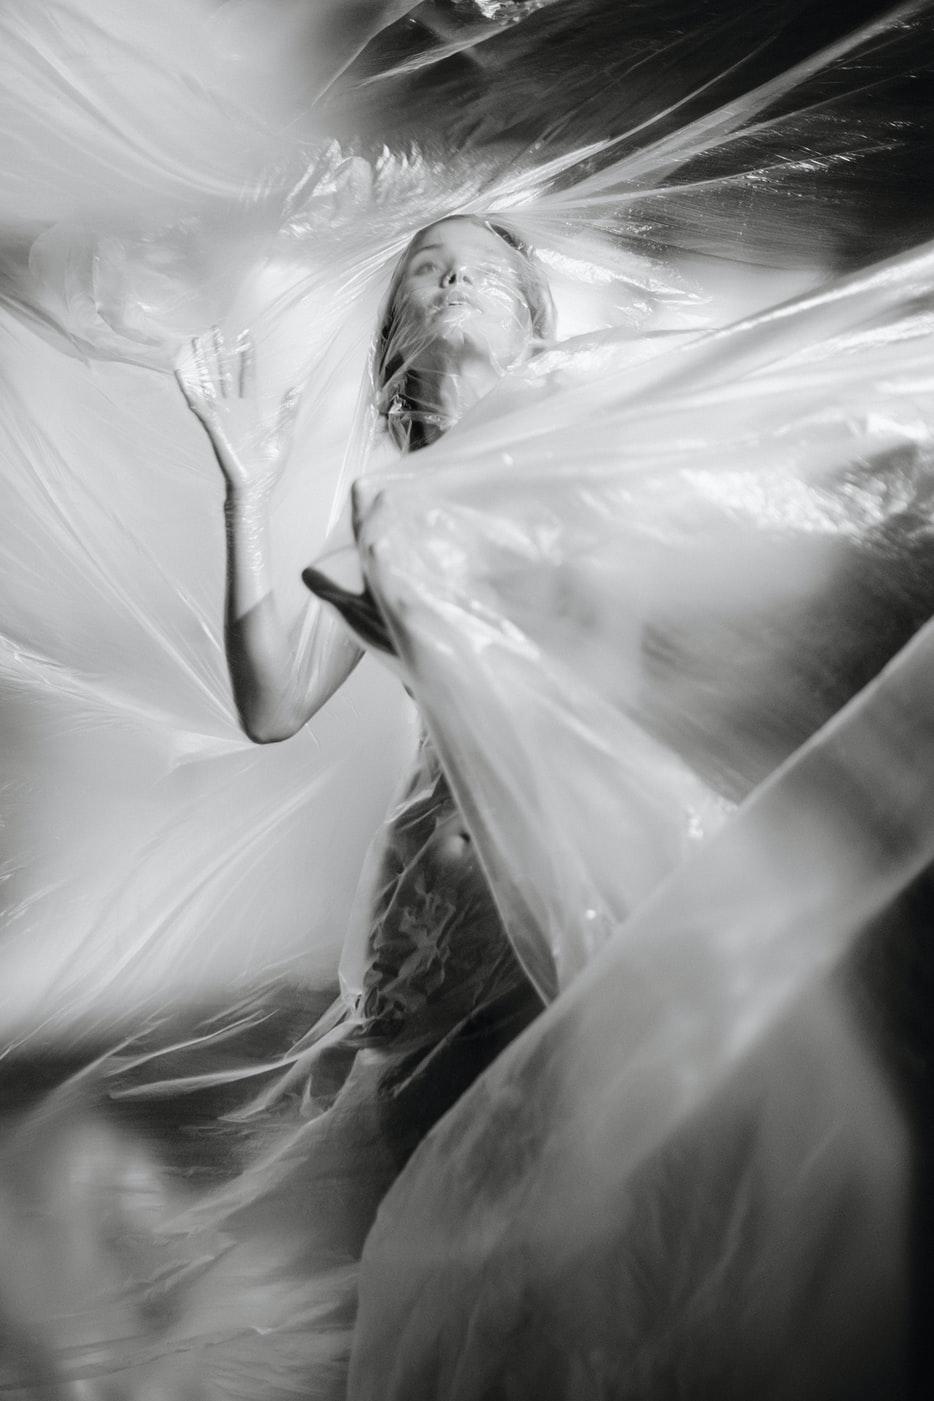 vanm-van-m-ecofriendly-ecology-sewing-made-in-belgium-picture-couture-nature-sustainable-fabrics-credits-unsplash-velizar-ivanov copie